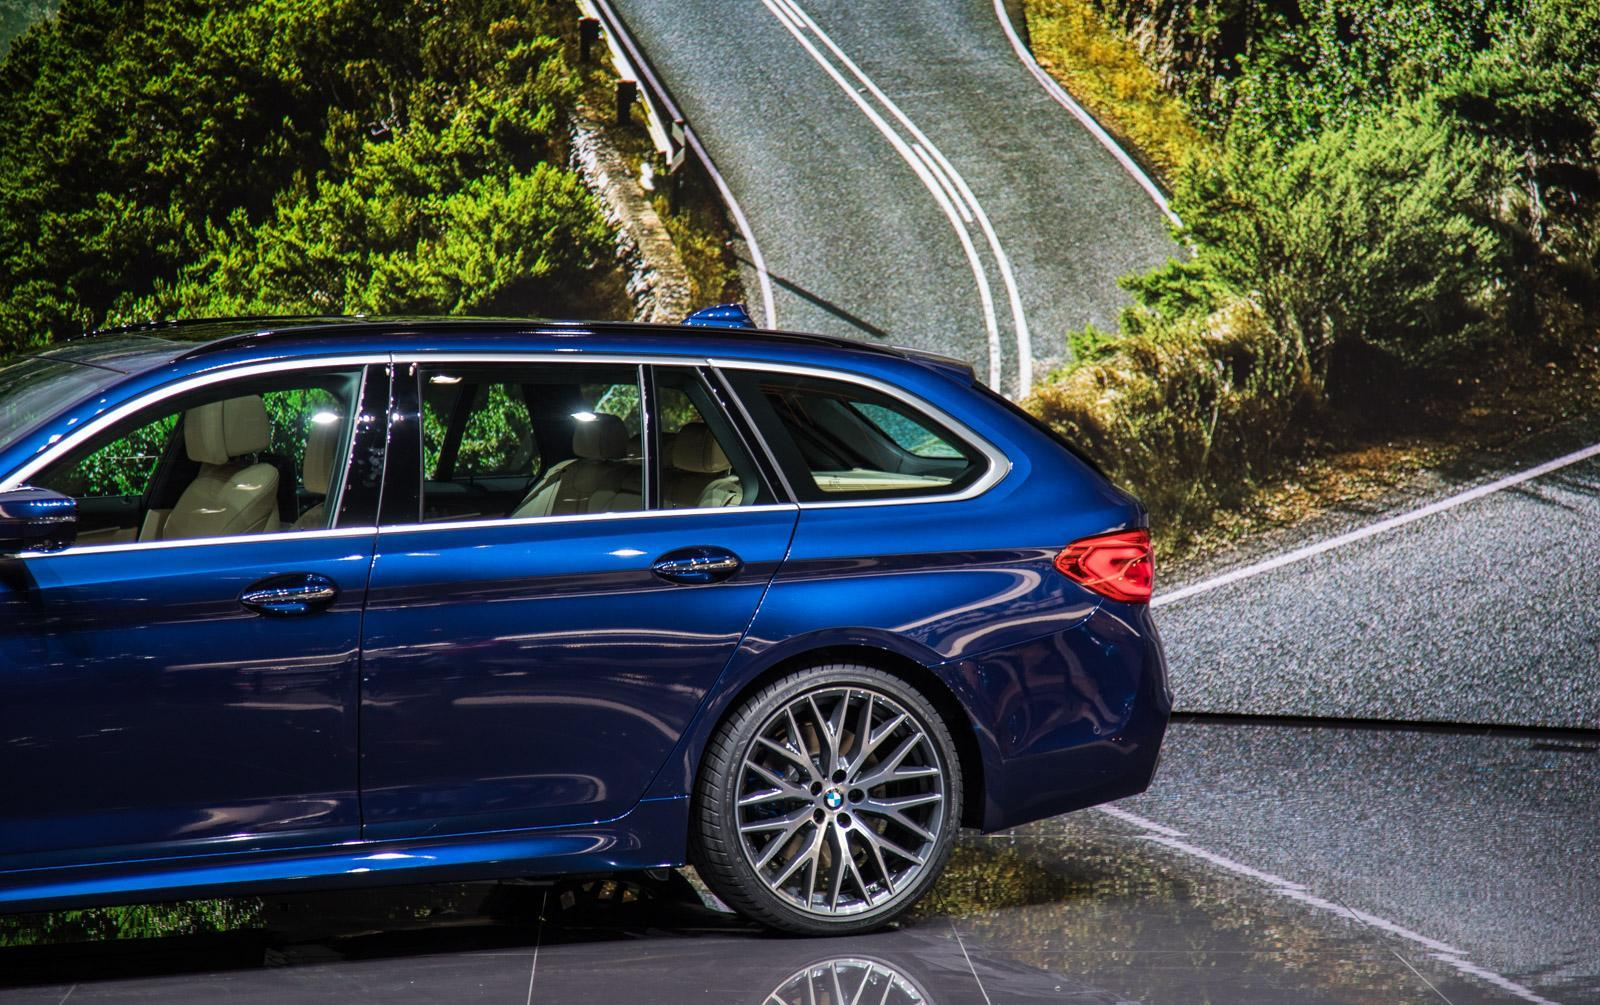 BMW-5-serie-touring-003